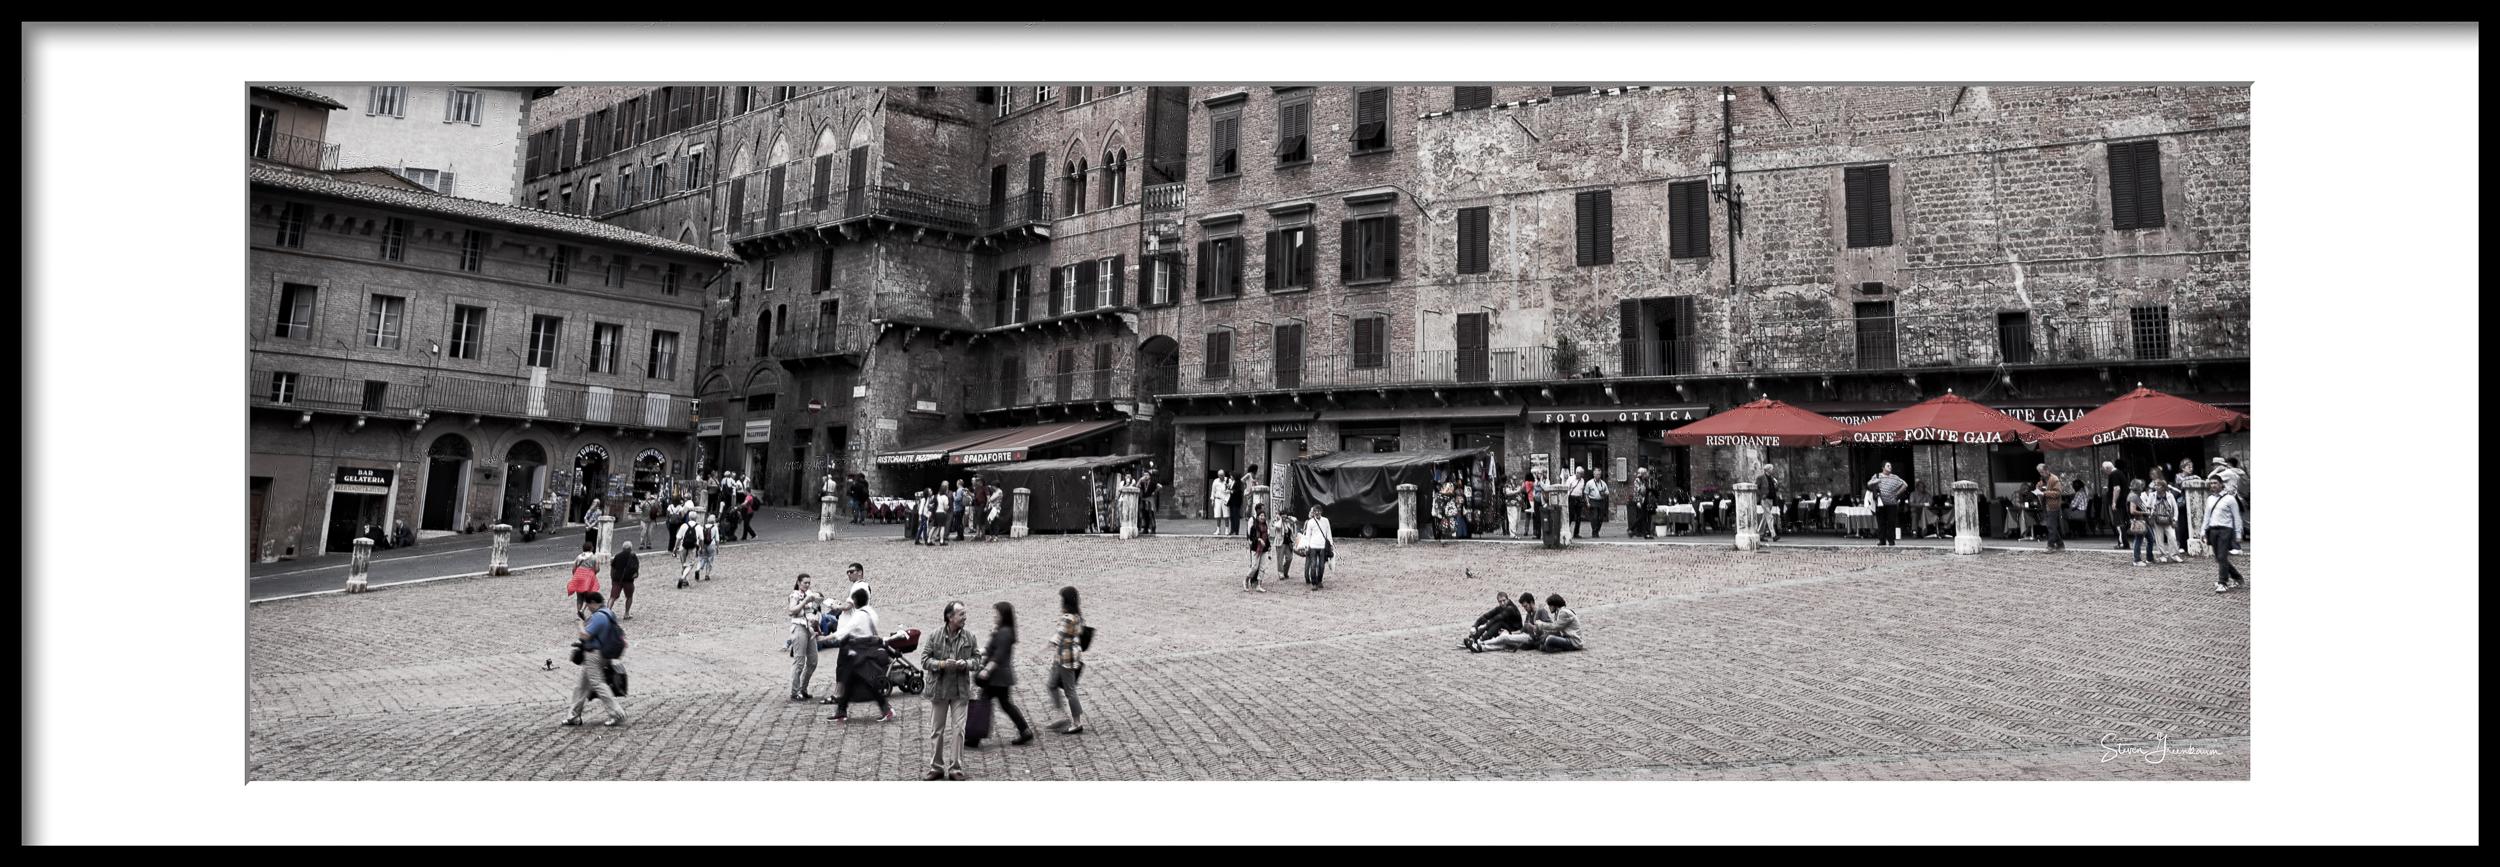 Piazza Del Campo, Siena 2014